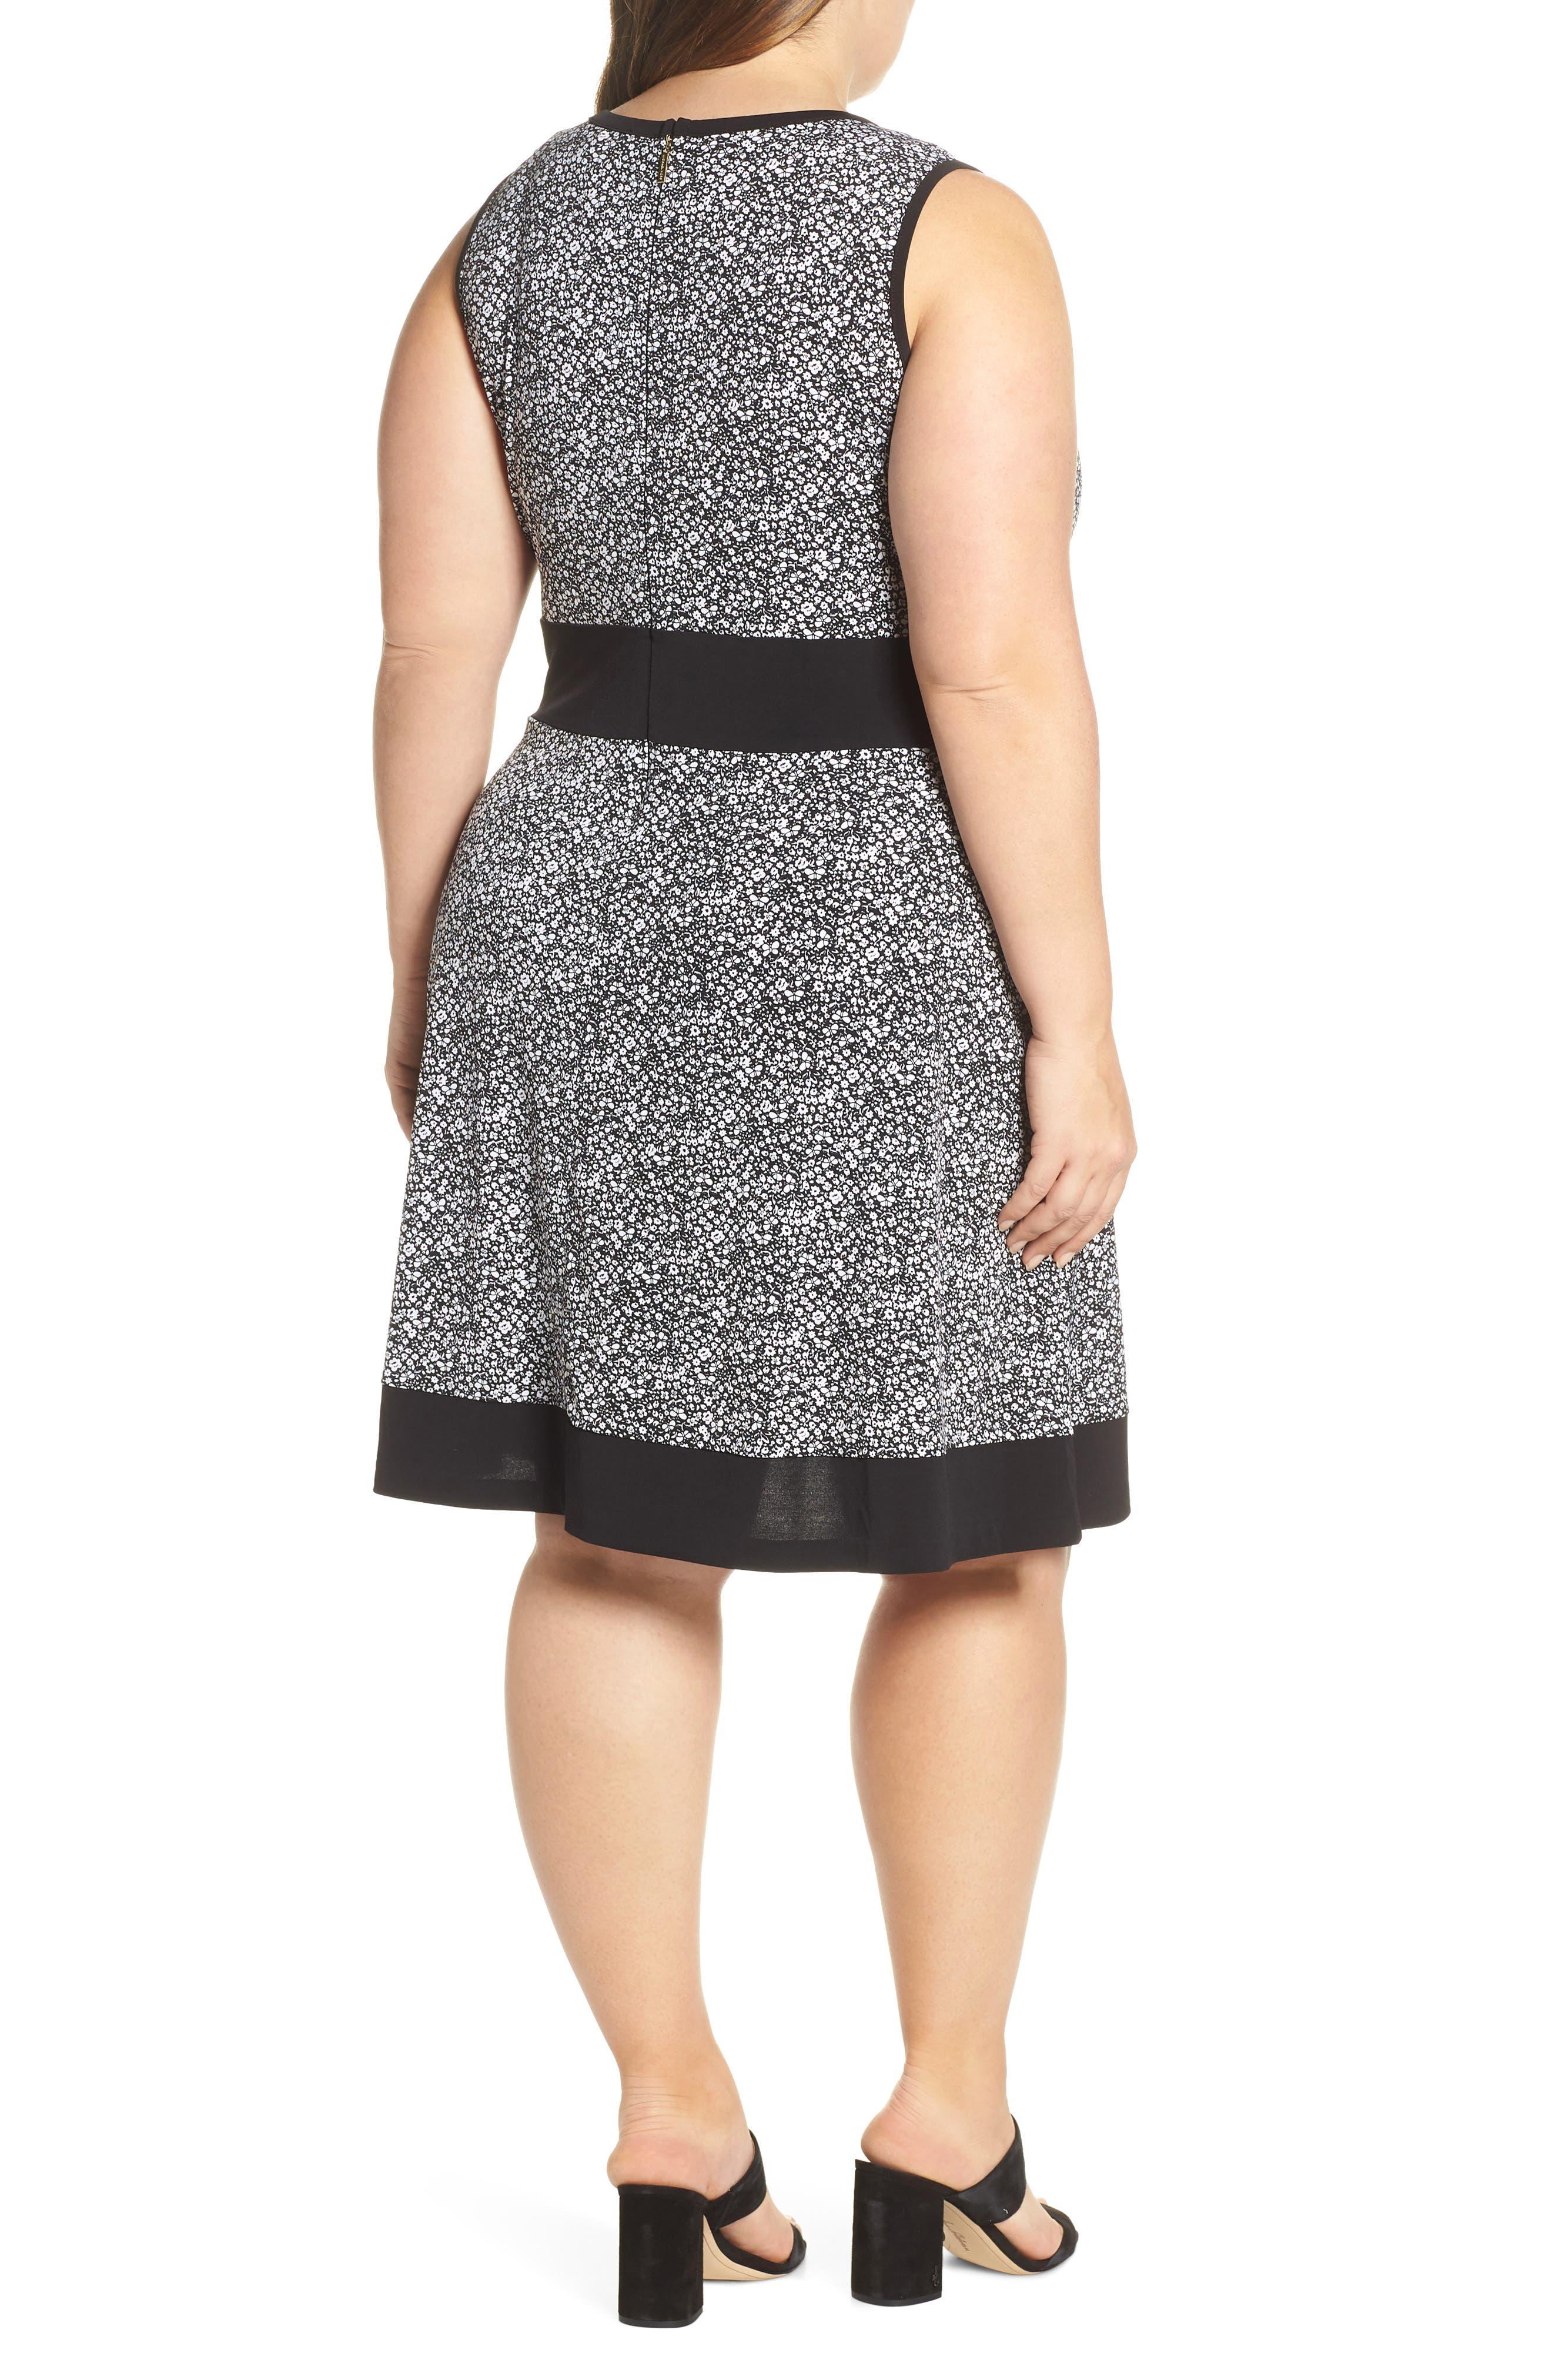 MICHAEL MICHAEL KORS, Spring Twist Dress, Alternate thumbnail 2, color, BLACK/ WHITE